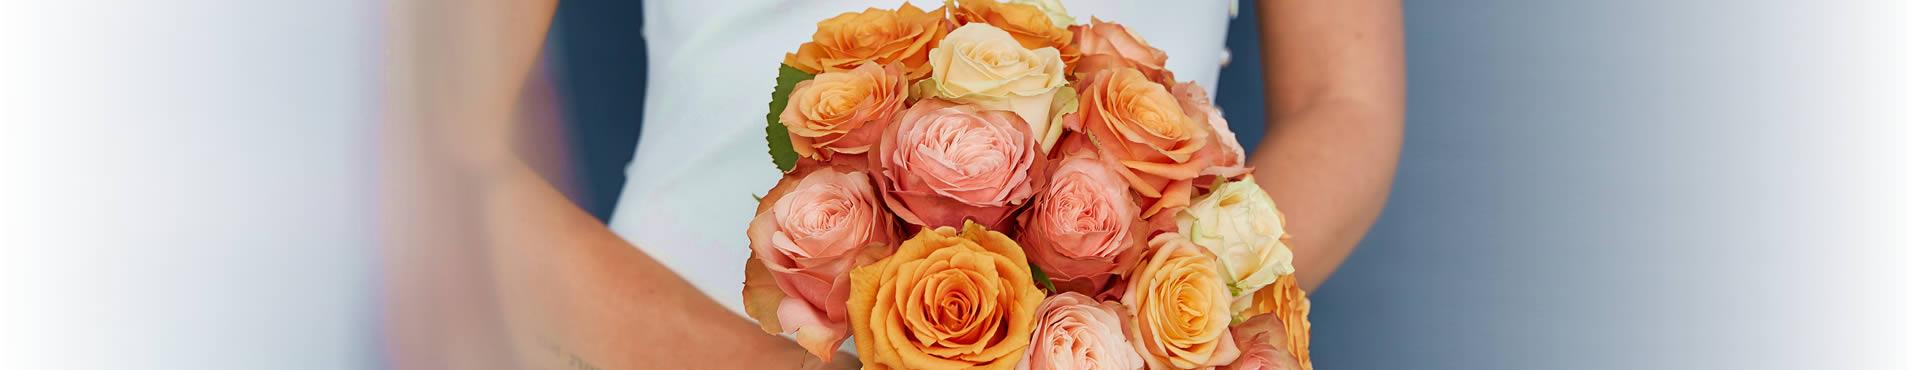 Rose bedeutung whatsapp rote Rote Rosen